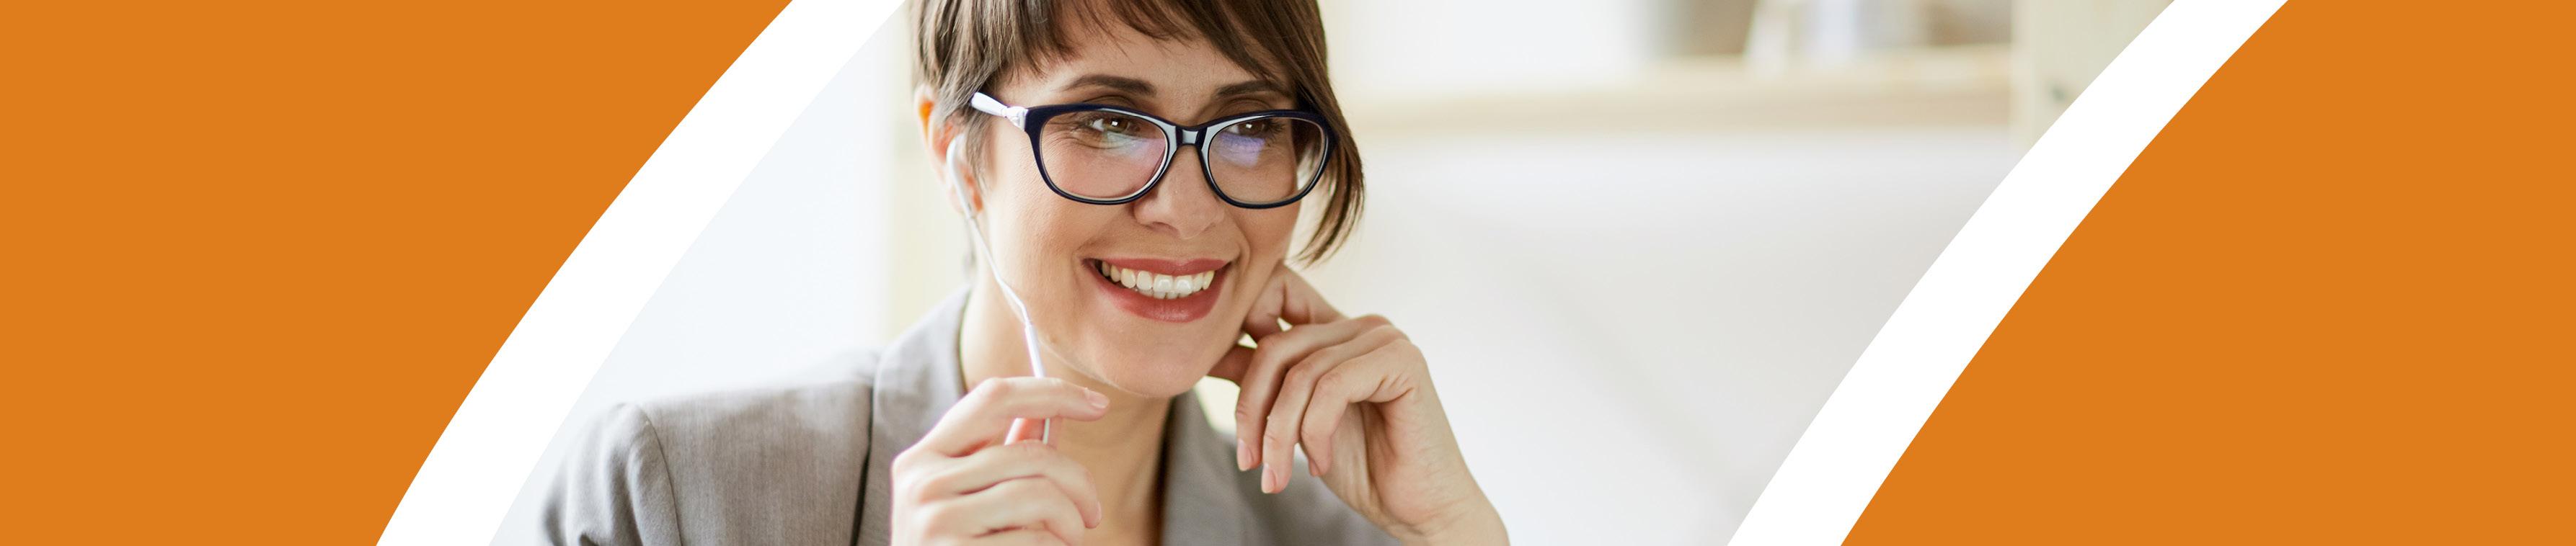 Woman smiling header image